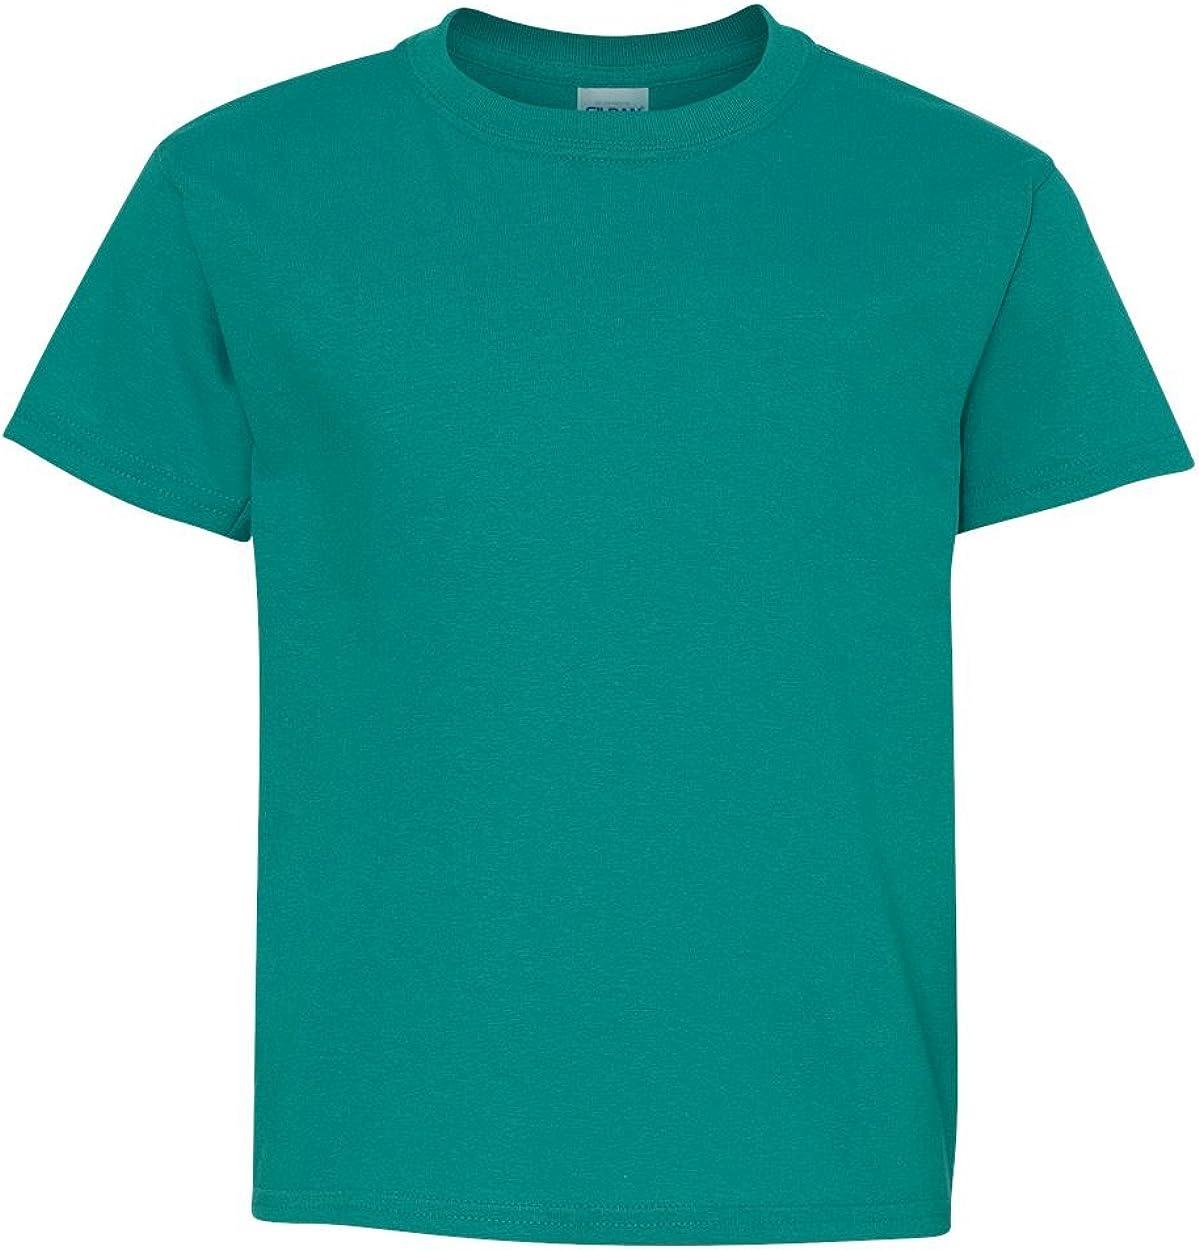 Gildan boys Heavy Cotton T-Shirt(G500B)-TROPICAL BLUE-XS